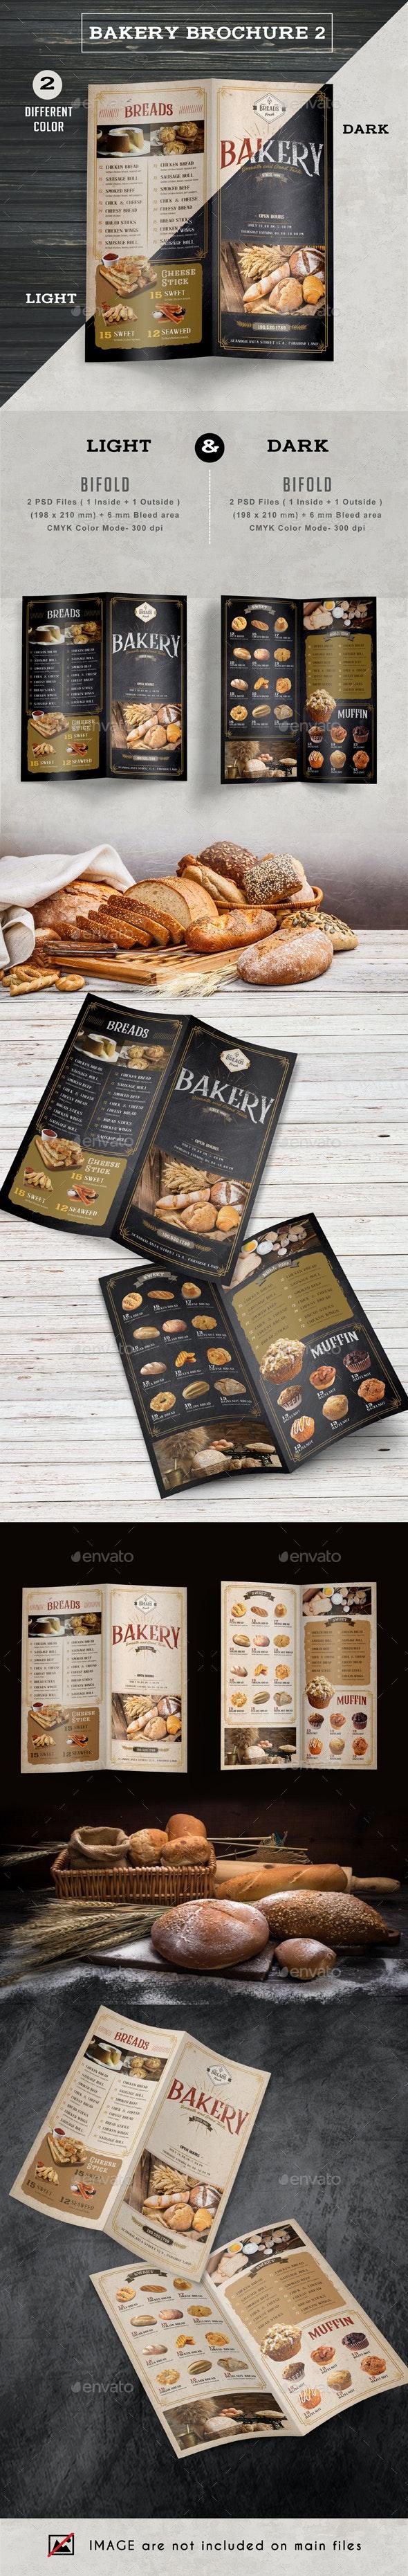 Bakery Brochure 2 - Brochures Print Templates